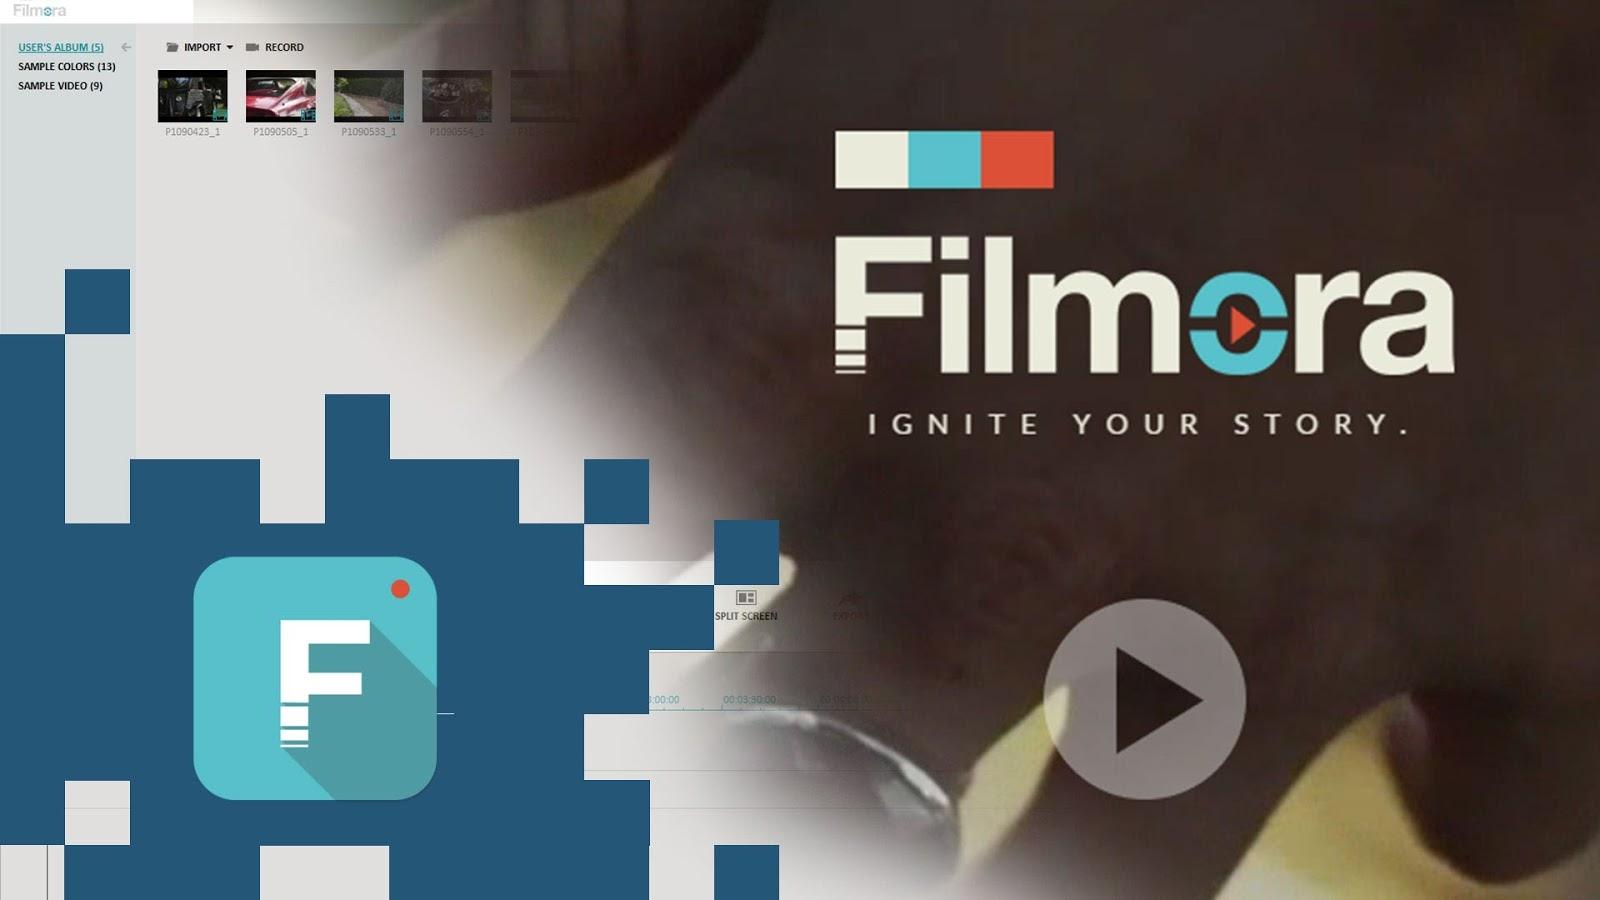 filmora registration key and email